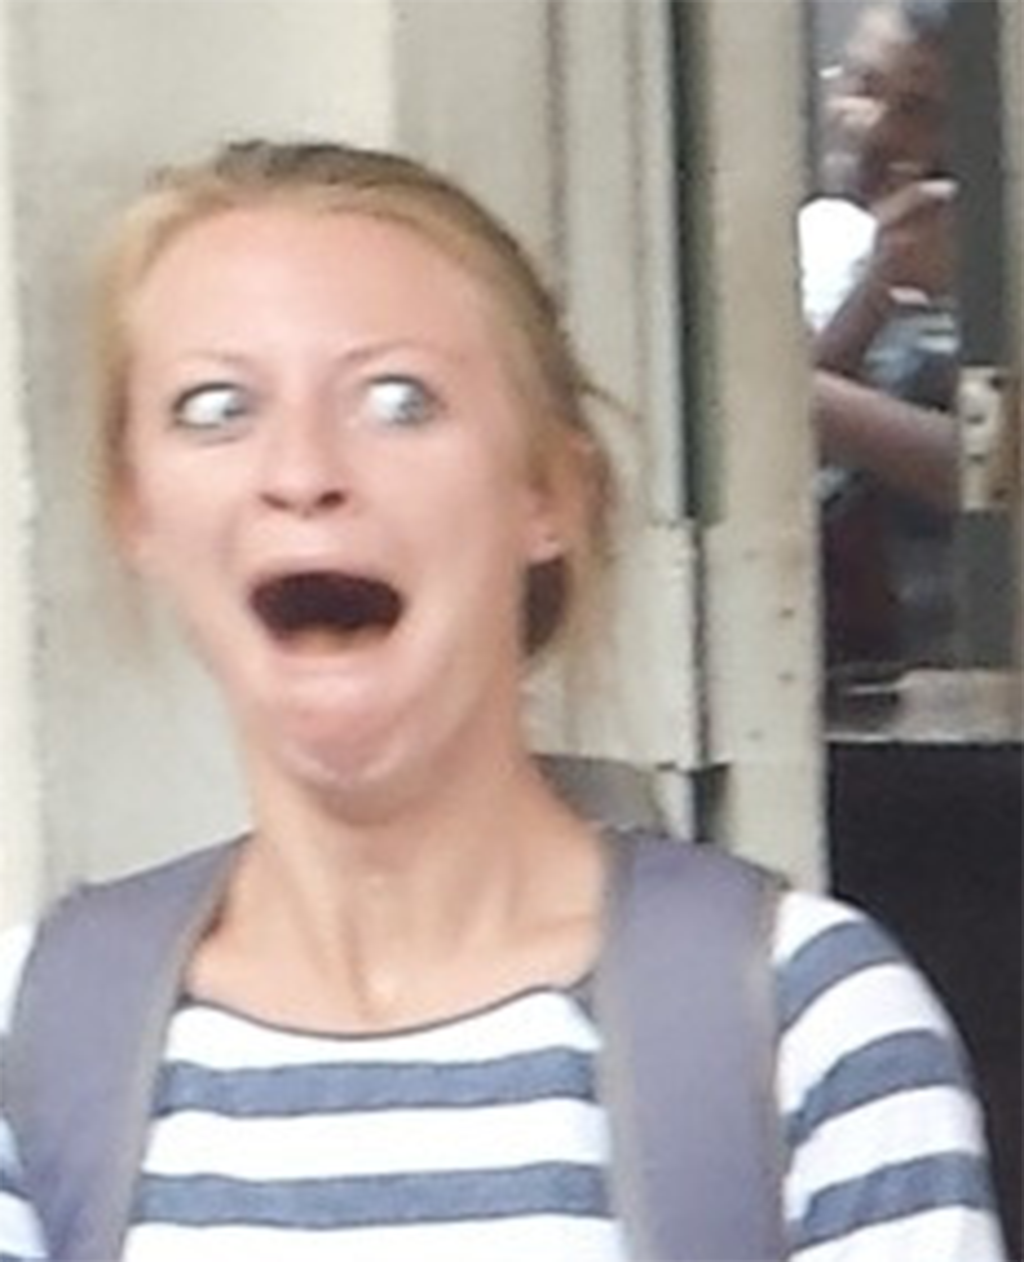 Surprised Girl Meme | www.imgkid.com - The Image Kid Has It!